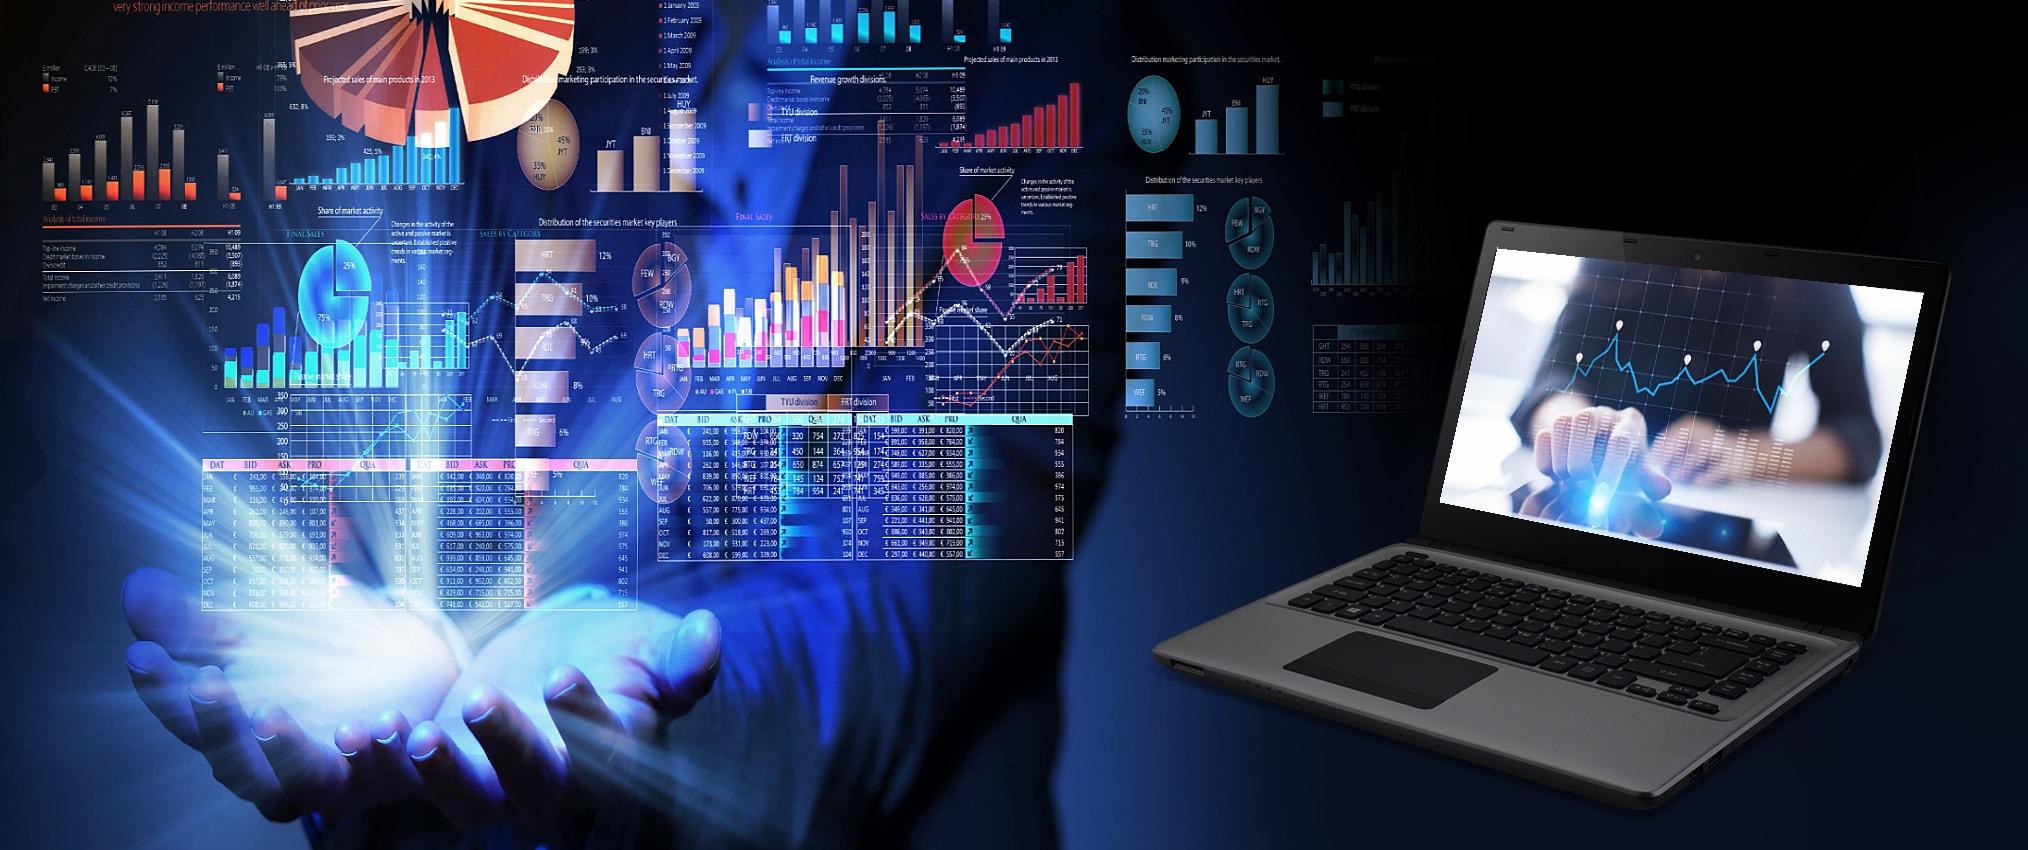 outsource big data analytics business